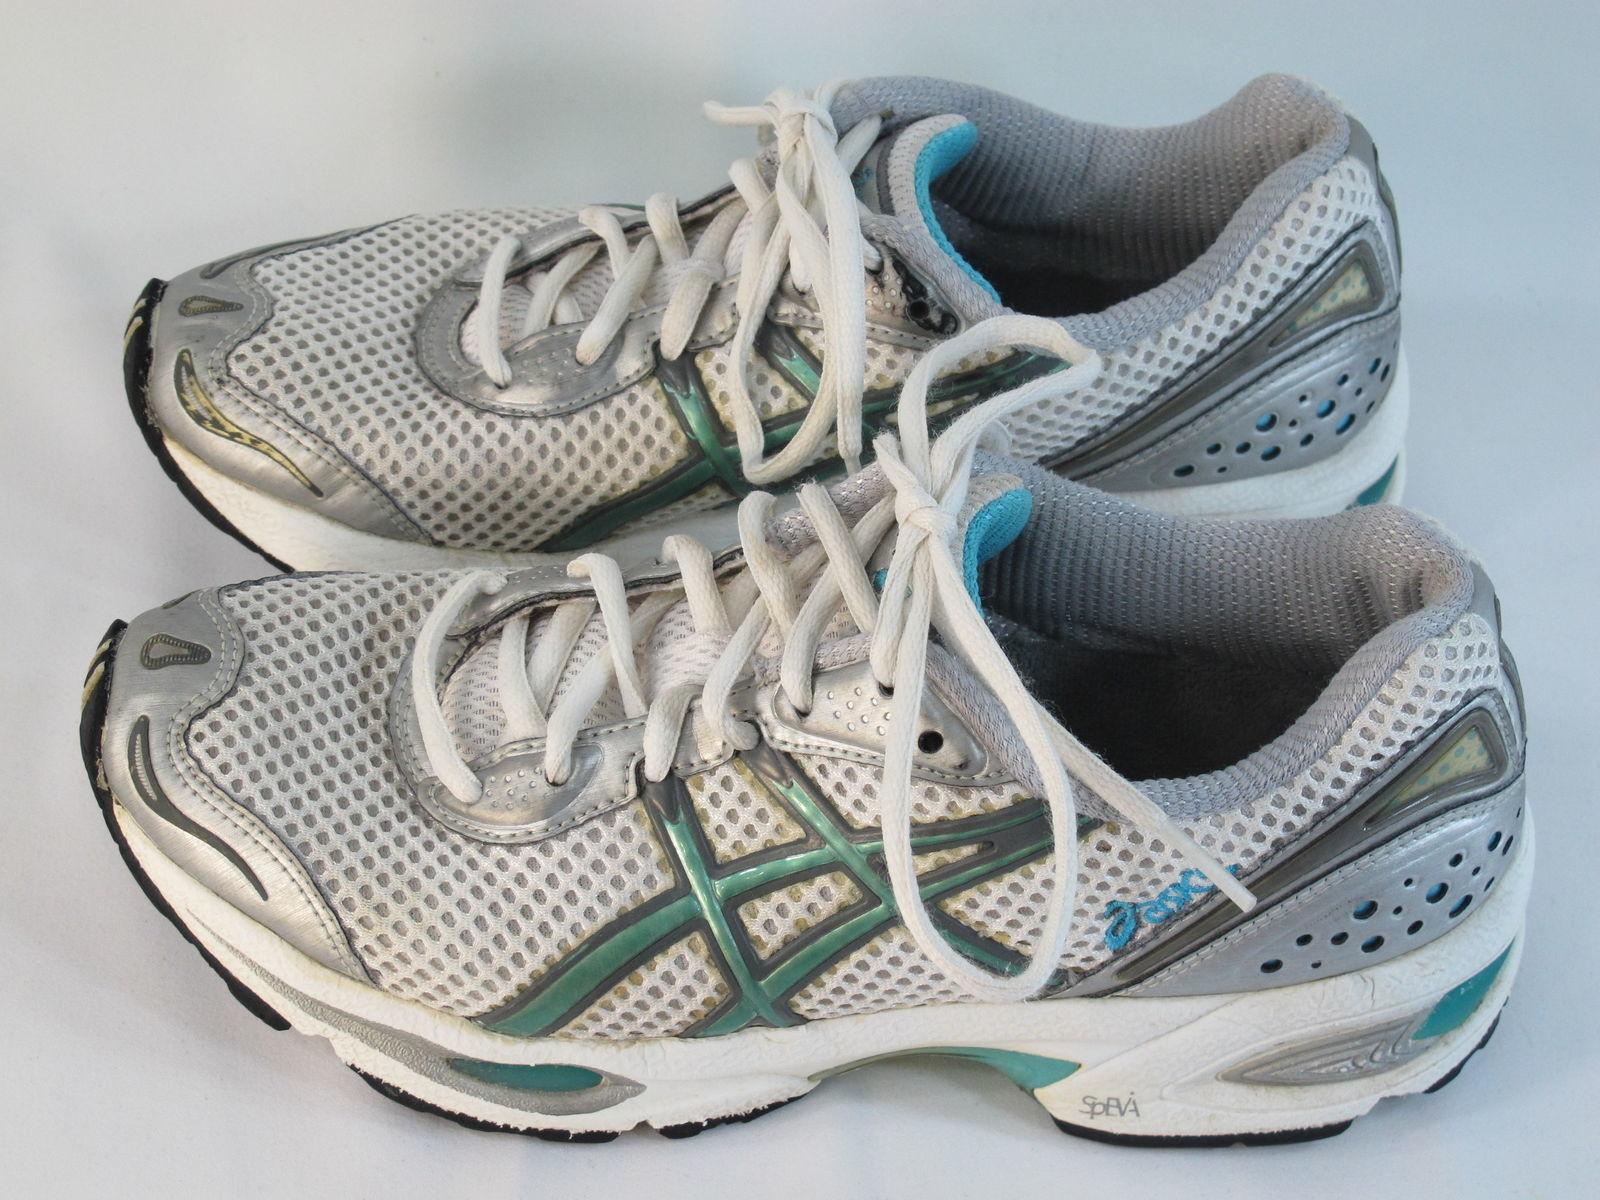 ASICS Gel Cumulus 11 Running Shoes Women's and 5 similar items